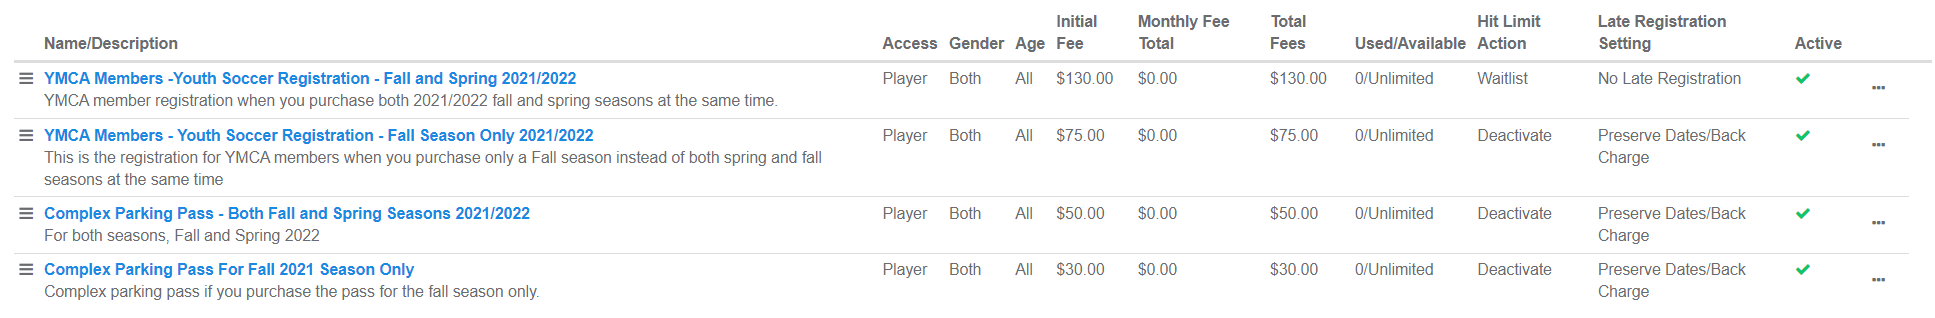 member soccer fees.PNG